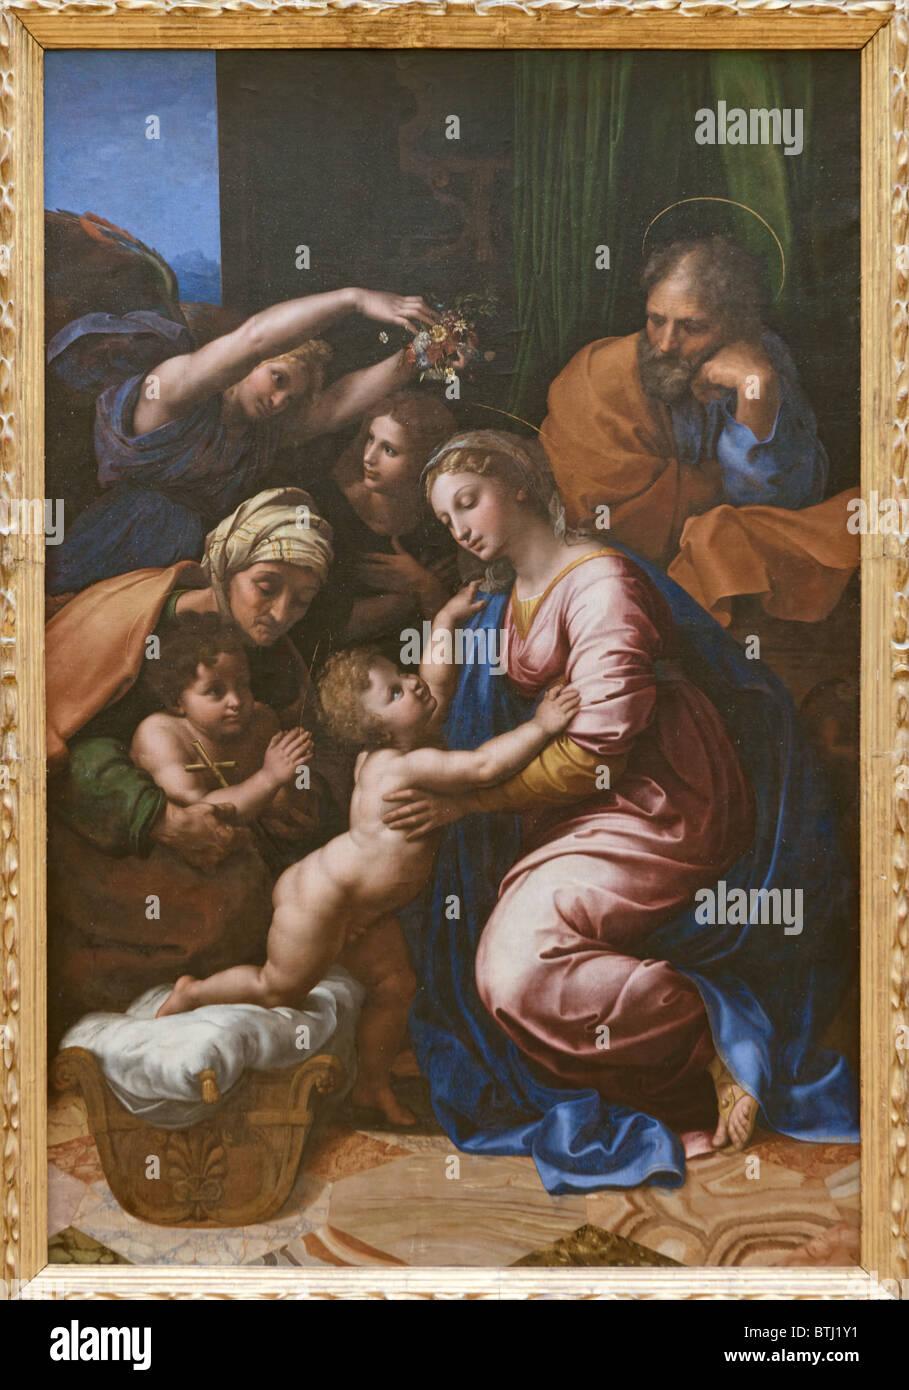 Grande Sainte Famille de Raphaël (Raffaello Sanzio da Urbino), ch. 1518, Musée du Louvre, Paris Photo Stock